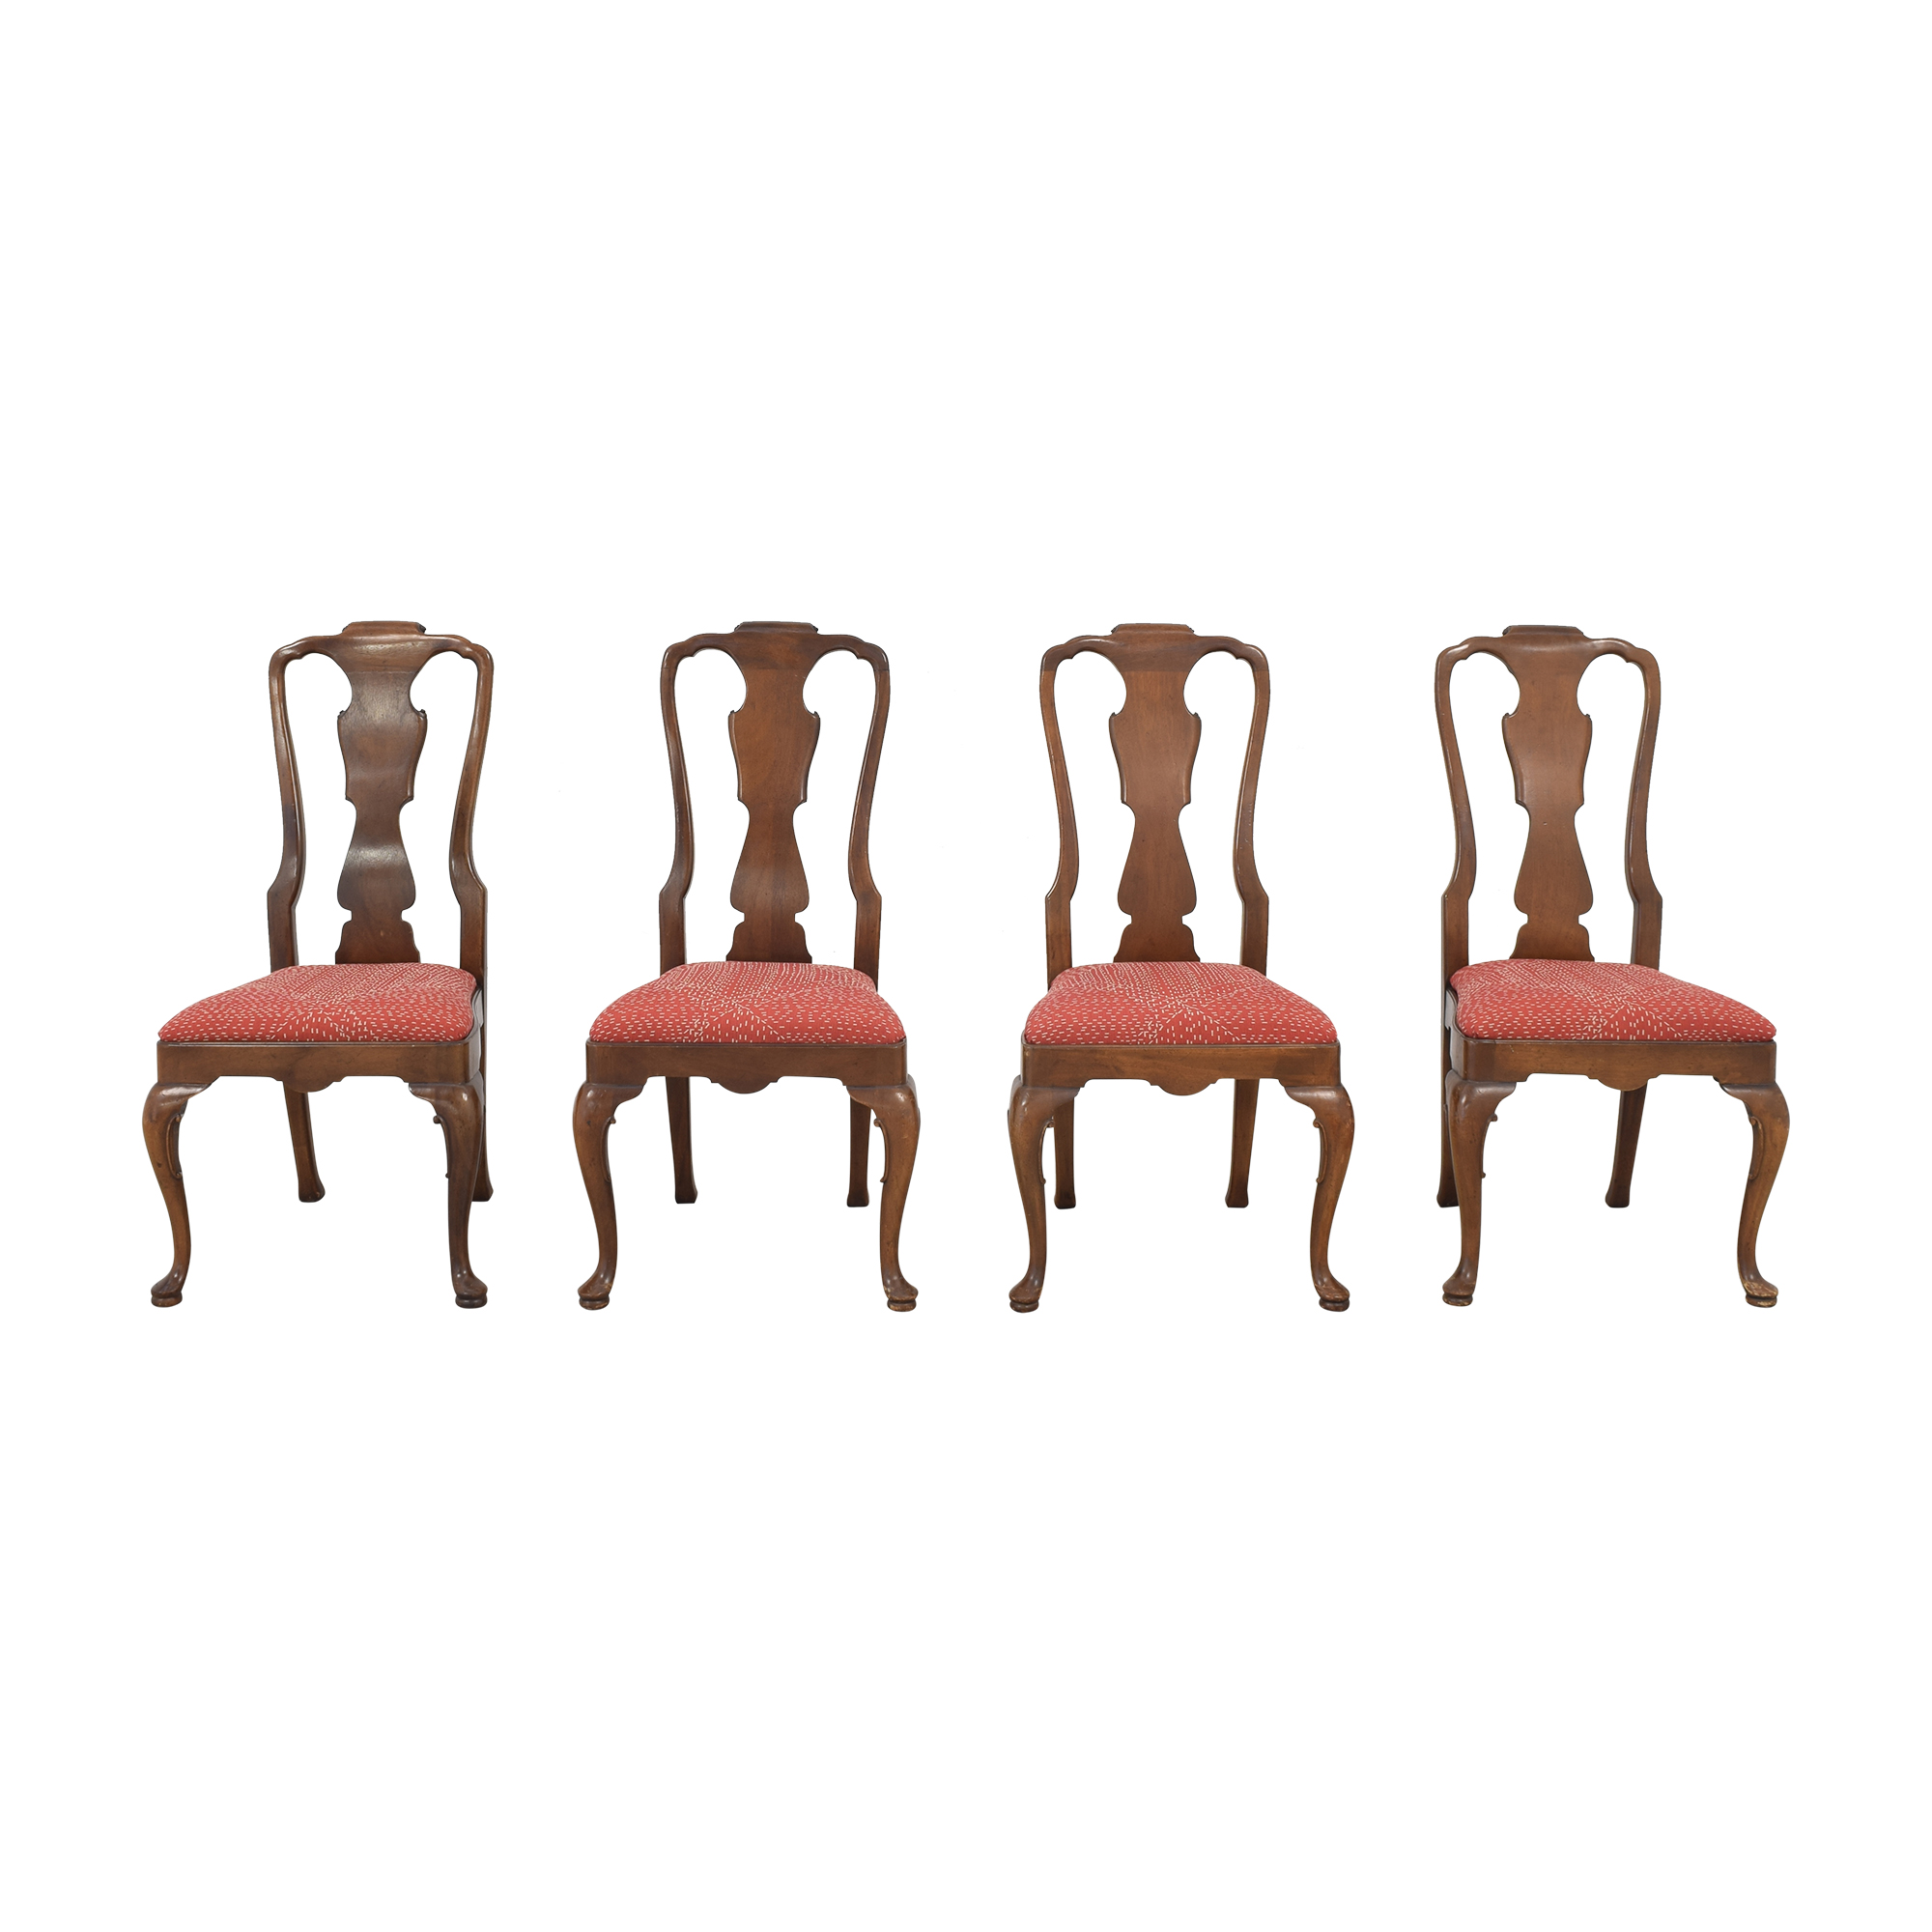 Henredon Furniture Henredon Queen Anne Chairs on sale